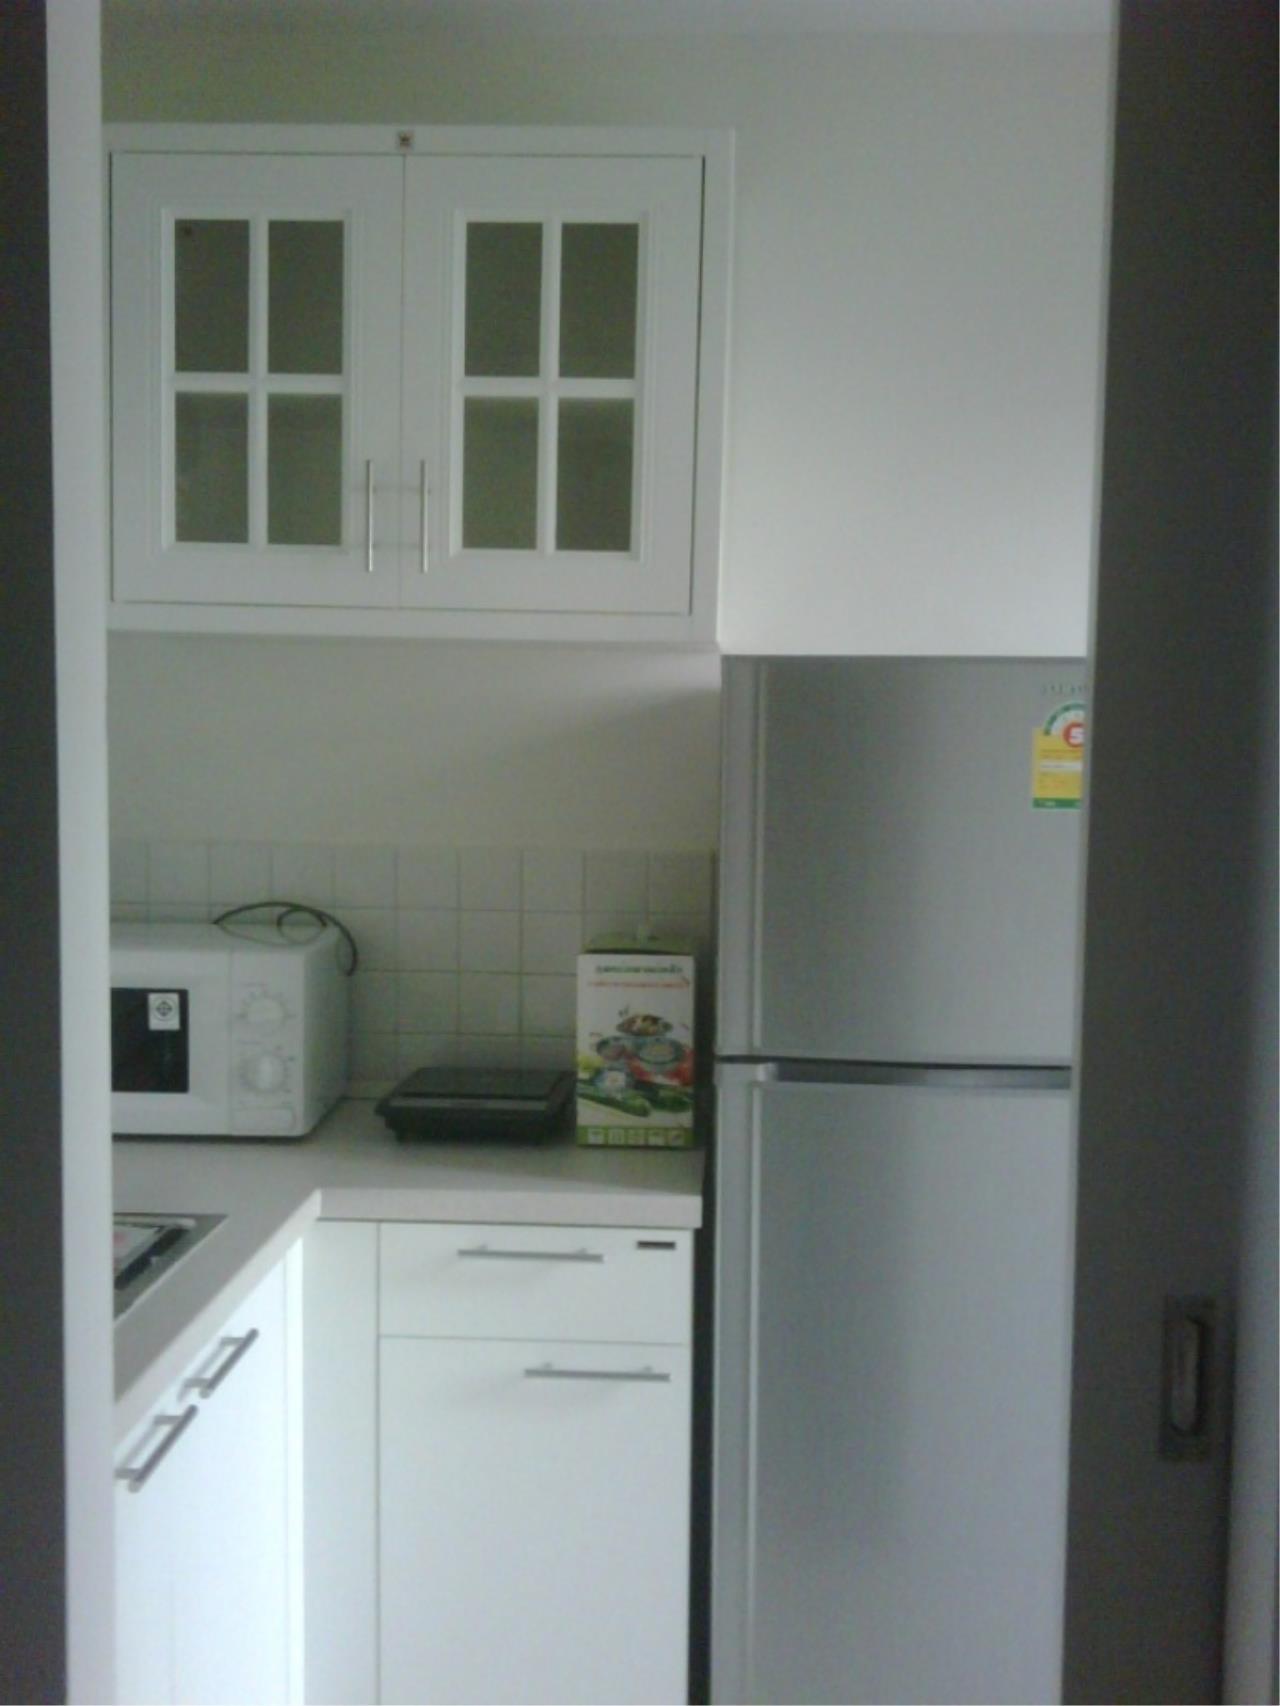 Century21 Skylux Agency's Condo One X Sukhumvit 26 / Condo For Rent / 1 Bedroom / 52.4 SQM / BTS Phrom Phong / Bangkok 11